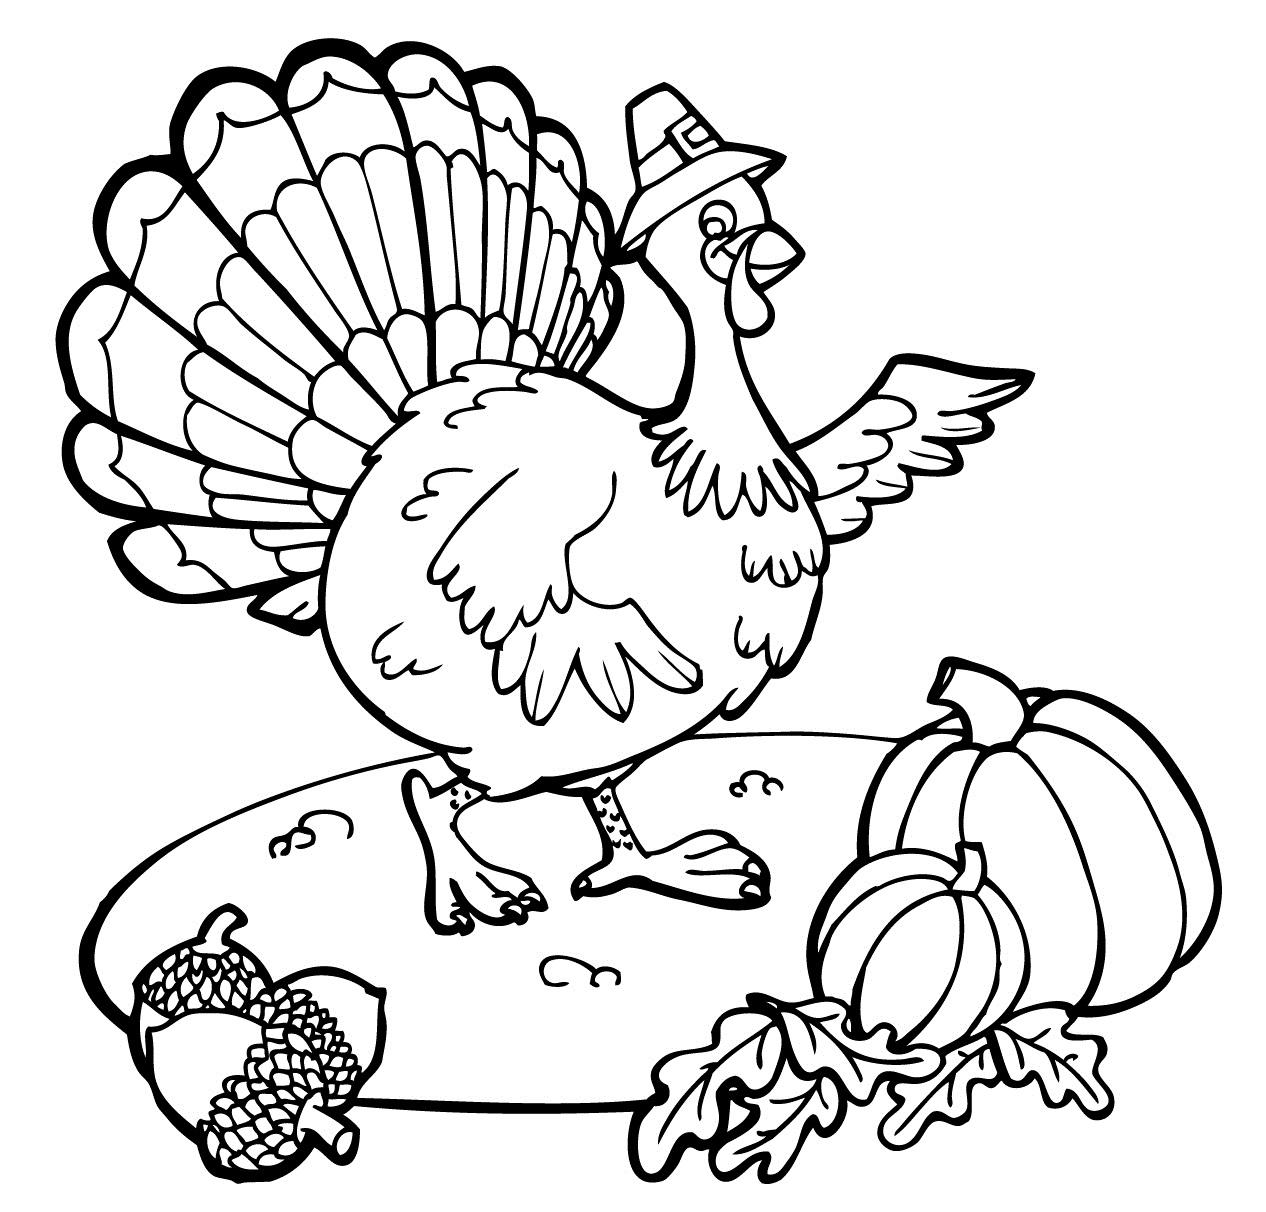 1266x1212 Big Thansgiving Coloring Pages Preschool Thanksgiving